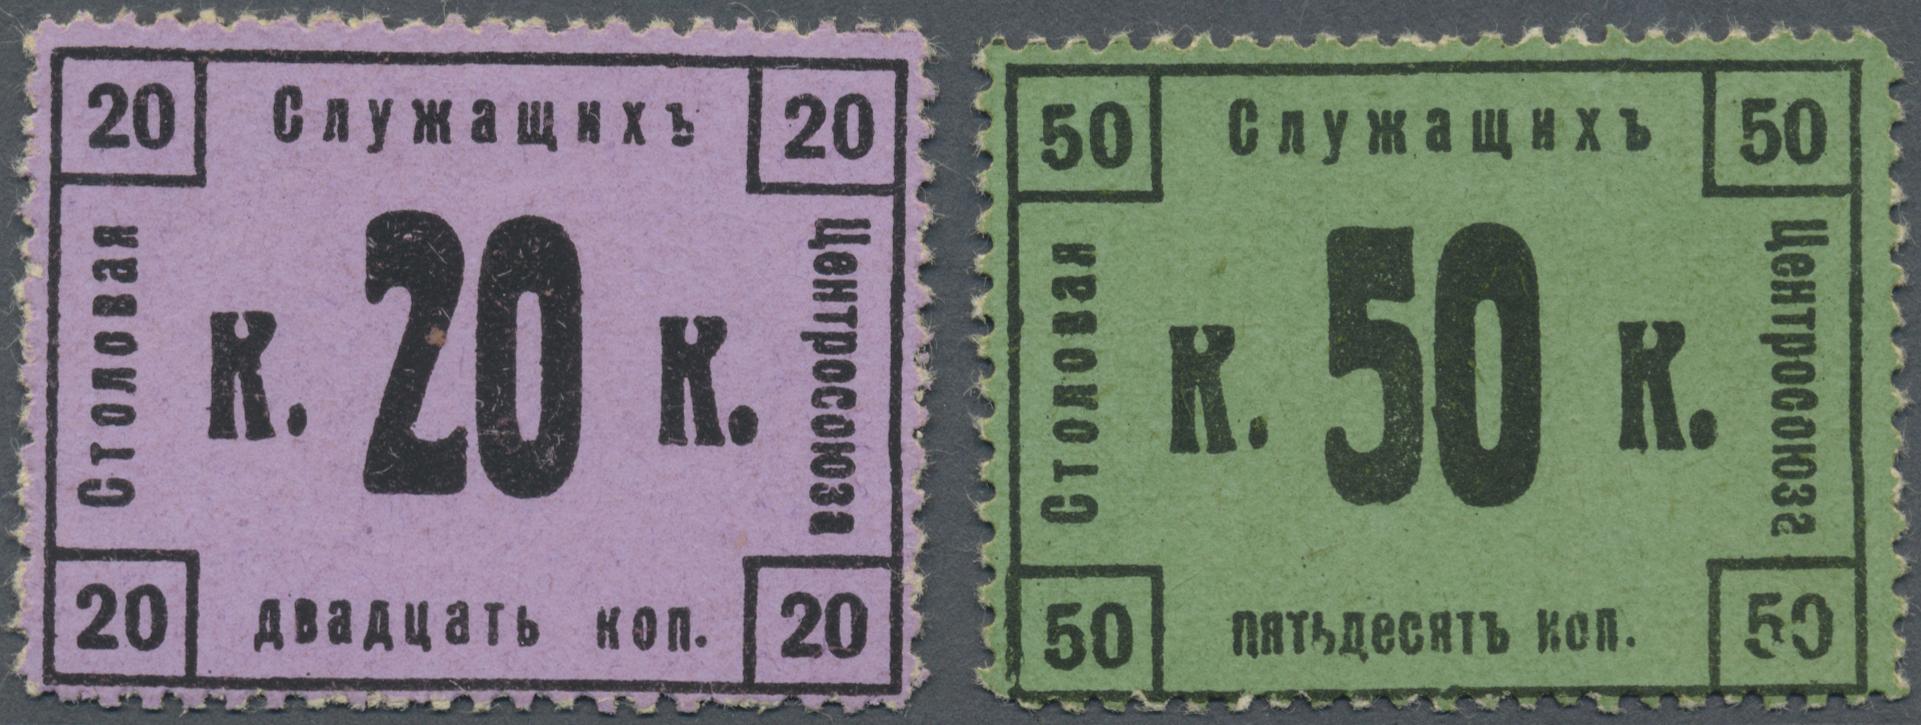 Stamp Auction - Russia / Russland | Banknoten - Banknotes Worldwide ...